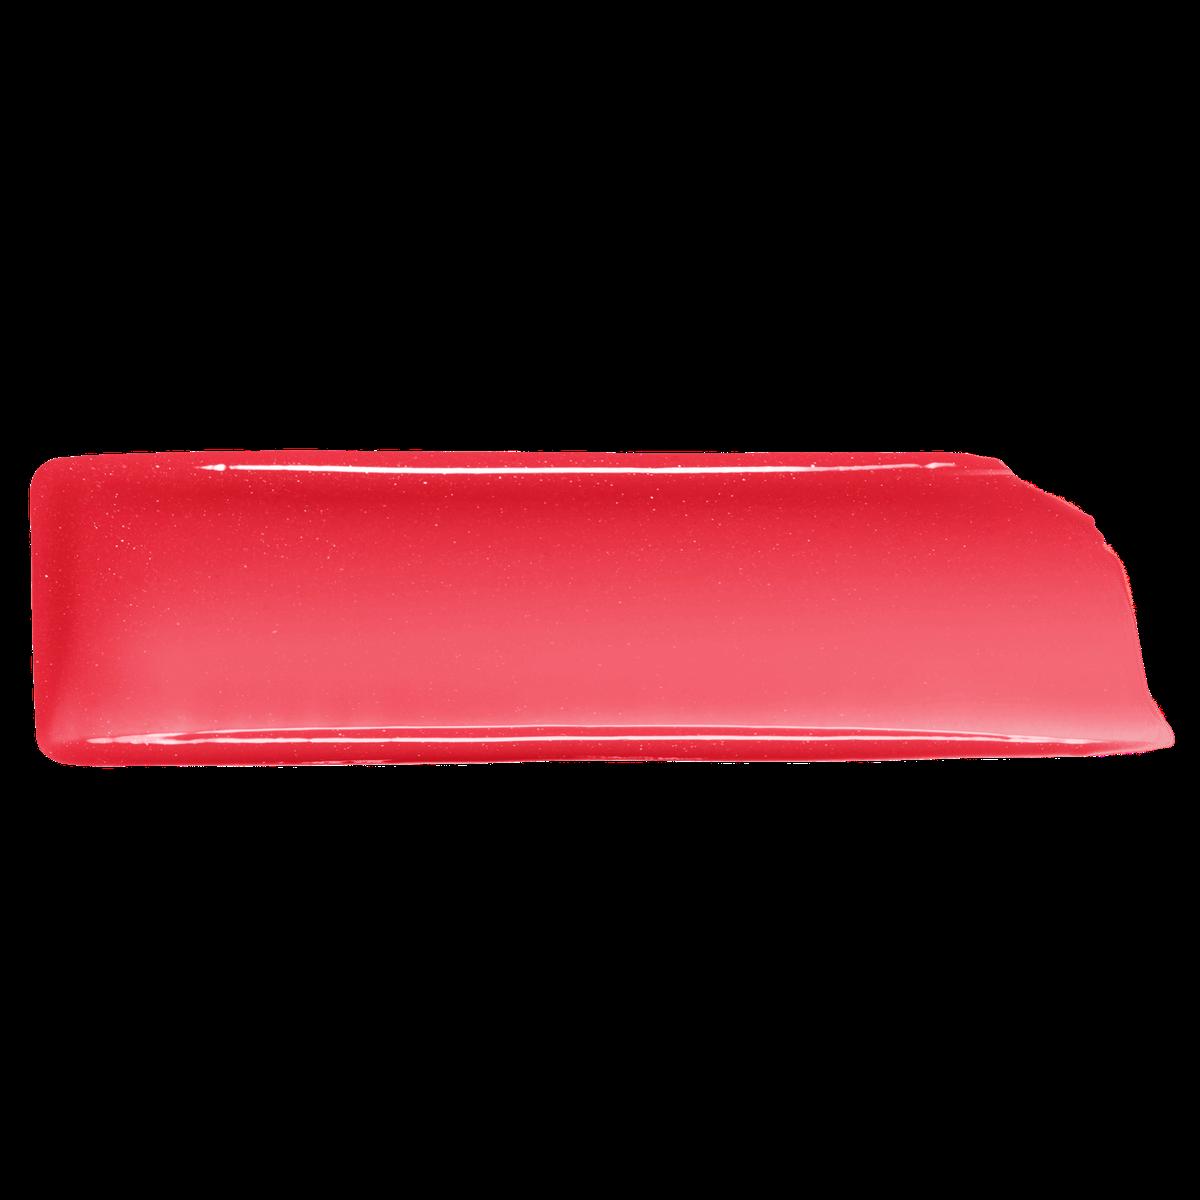 GIVENCHY Lipstick Rouge Interdit Vinyl Extreme Shine Colors 10 Rouge Provocant